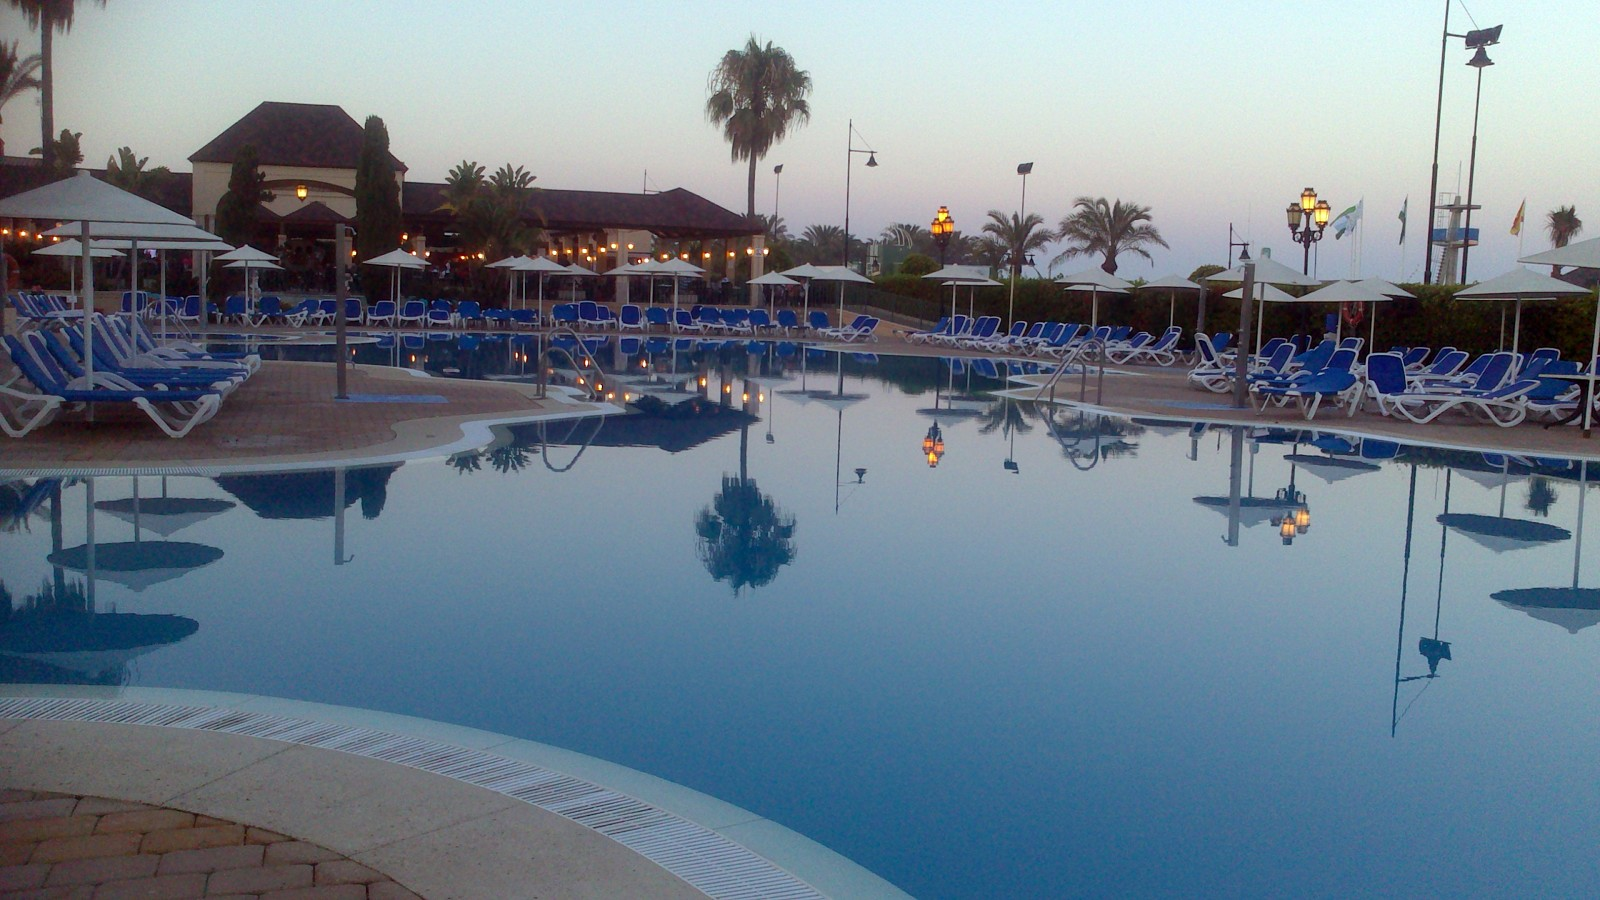 Foto piscina de forma de piscinas leal 416946 habitissimo for Piscinas publicas valencia